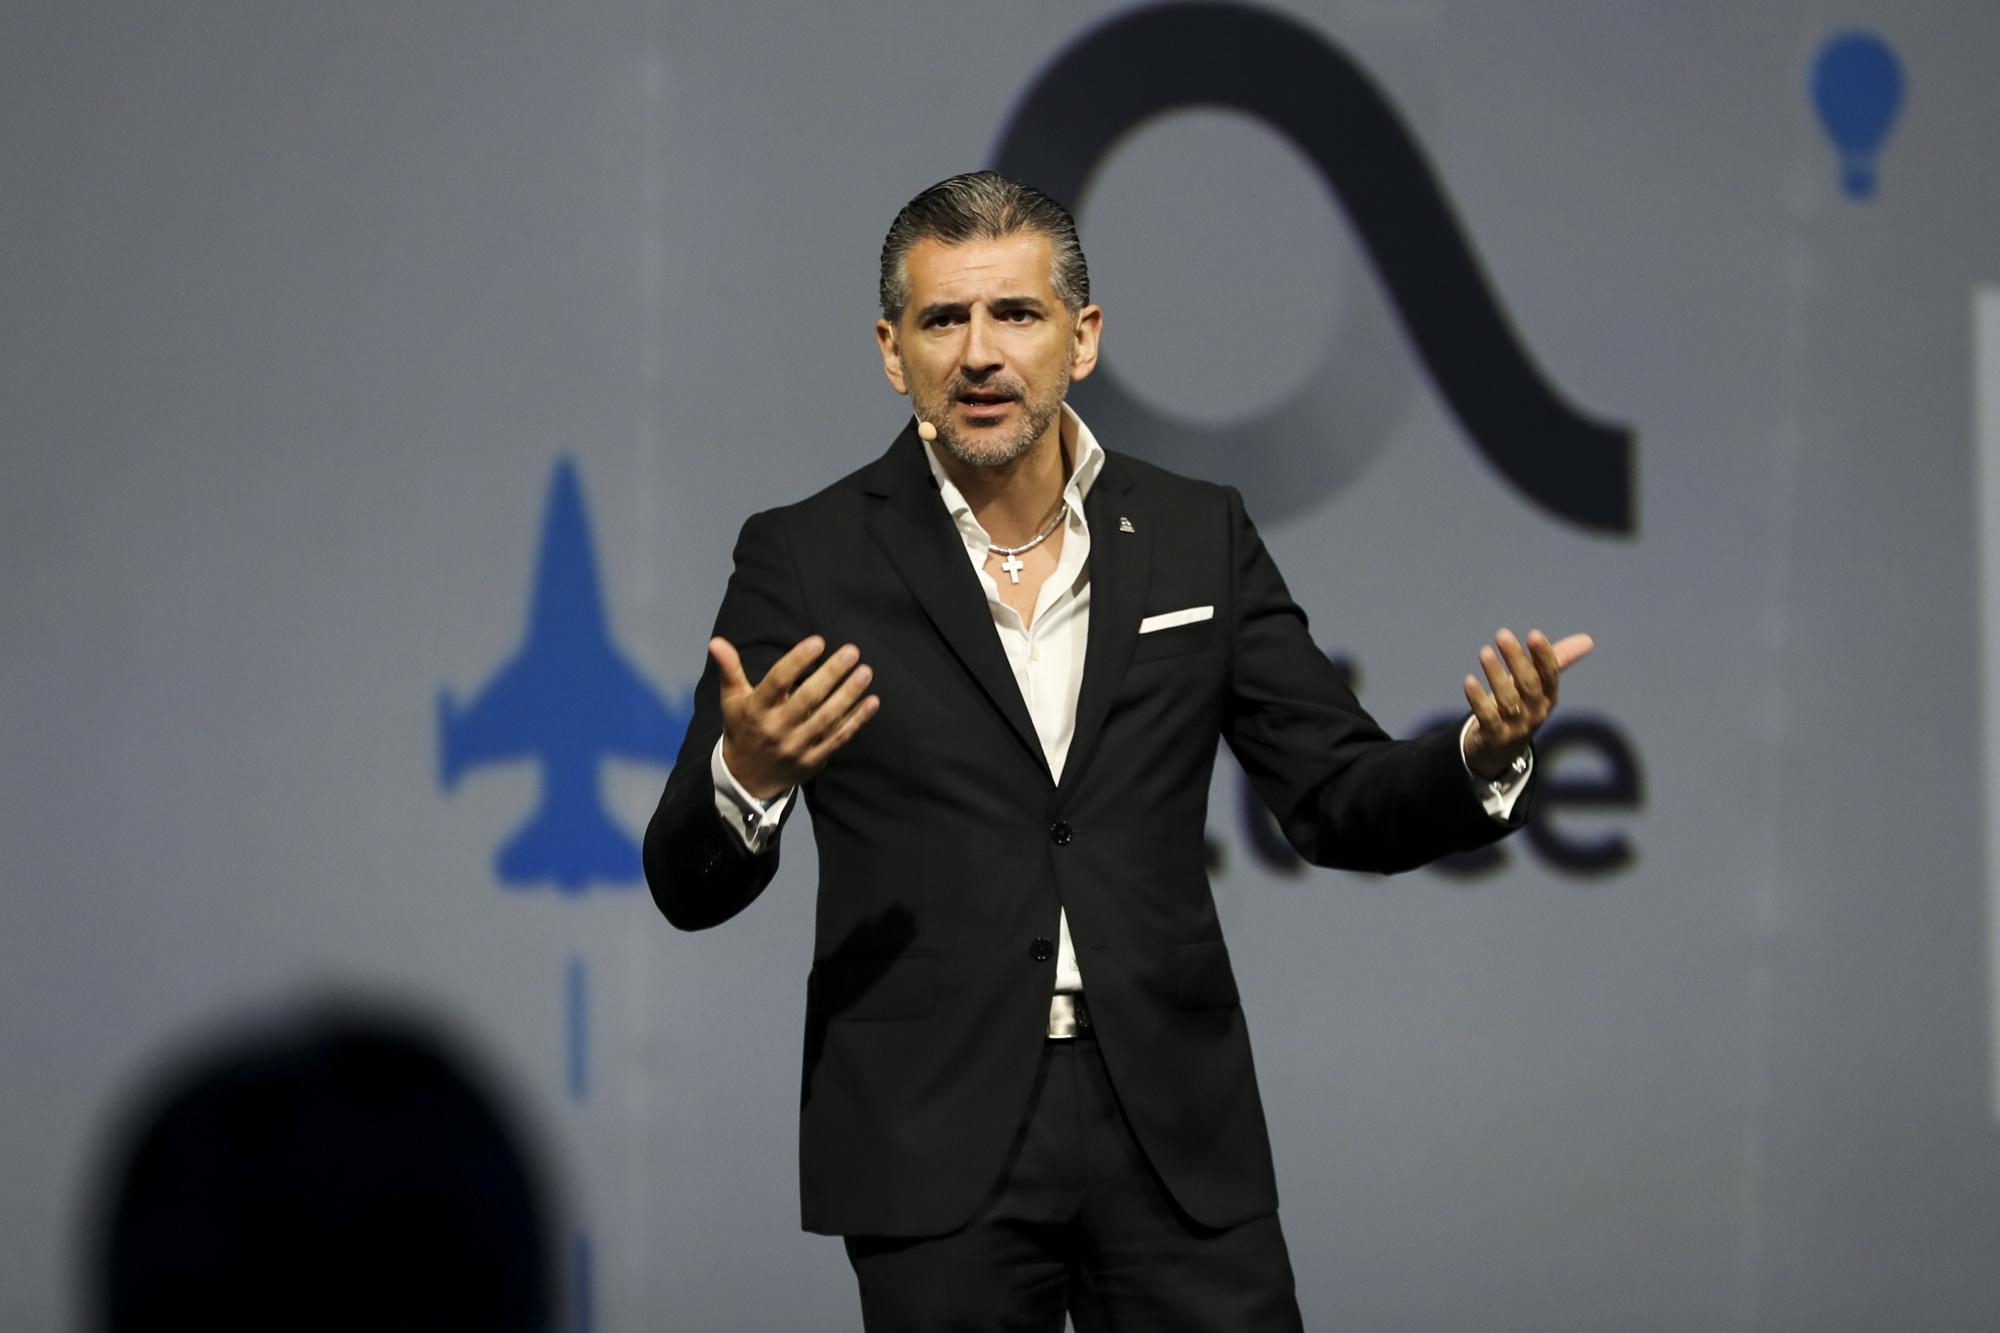 Alexandre Fonseca, CEO da Altice Portugal